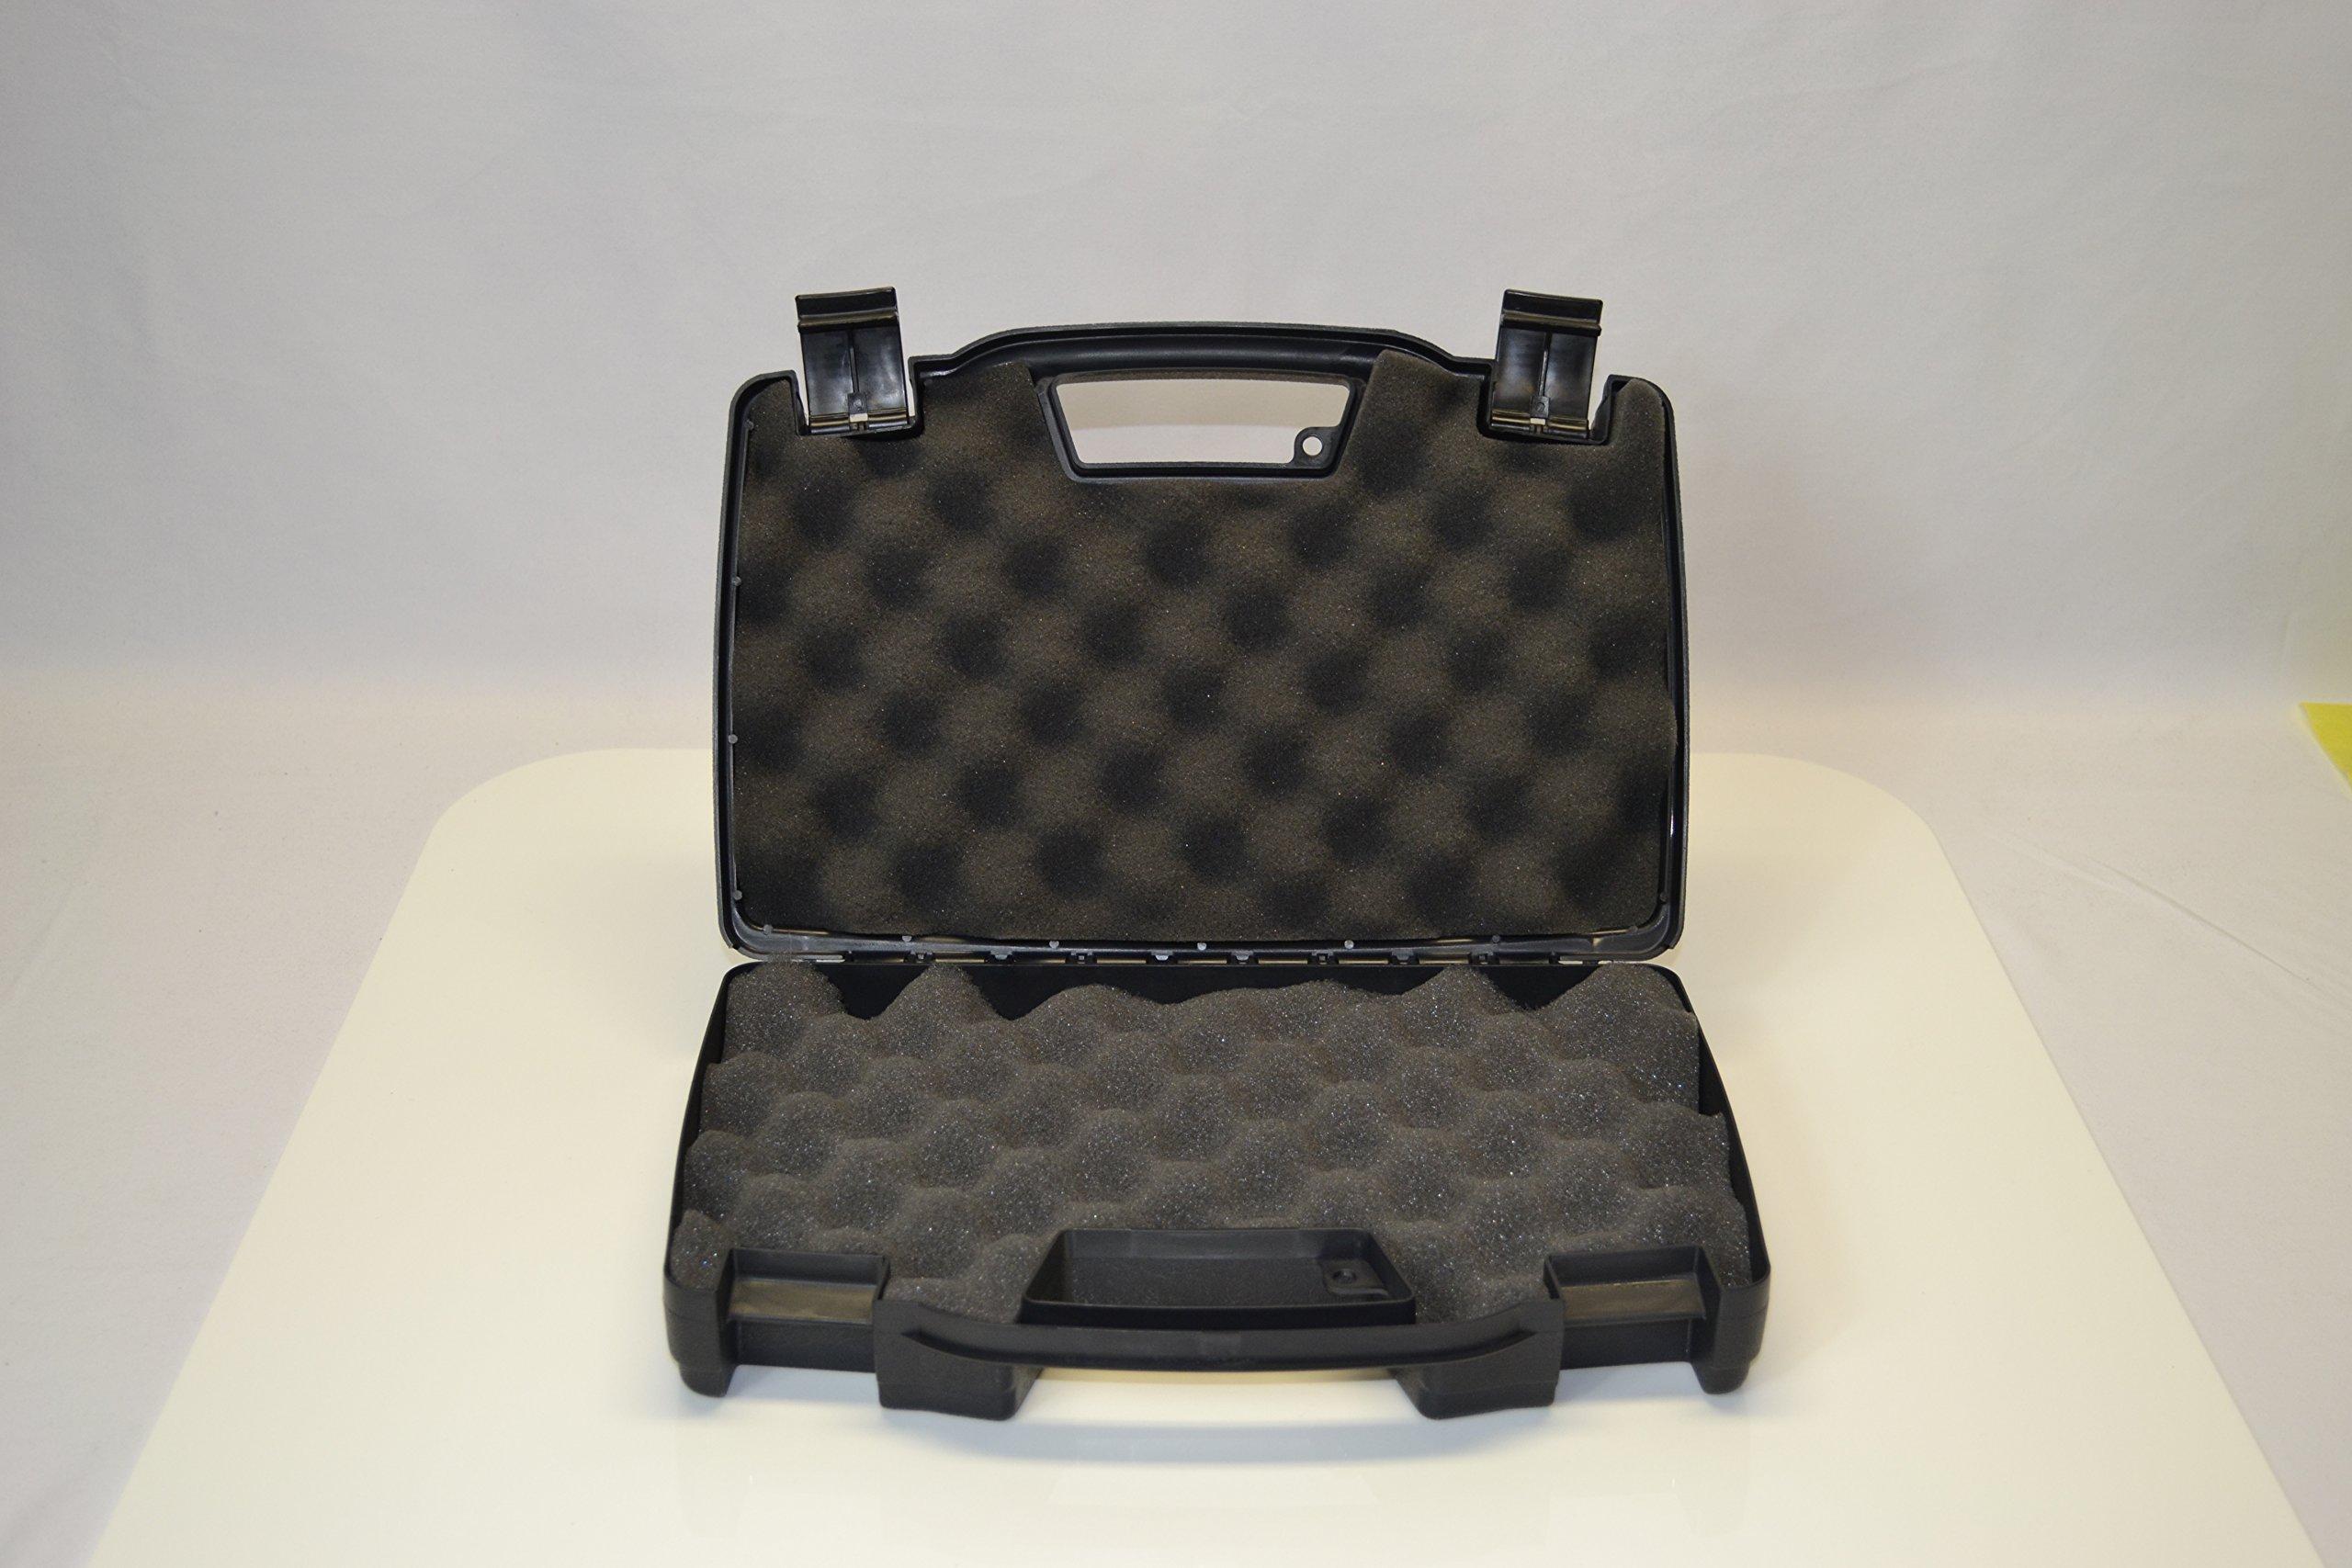 Zieglerworld Table Shuffleboard Puck Weight Hard Case & Carrier by Zieglerworld